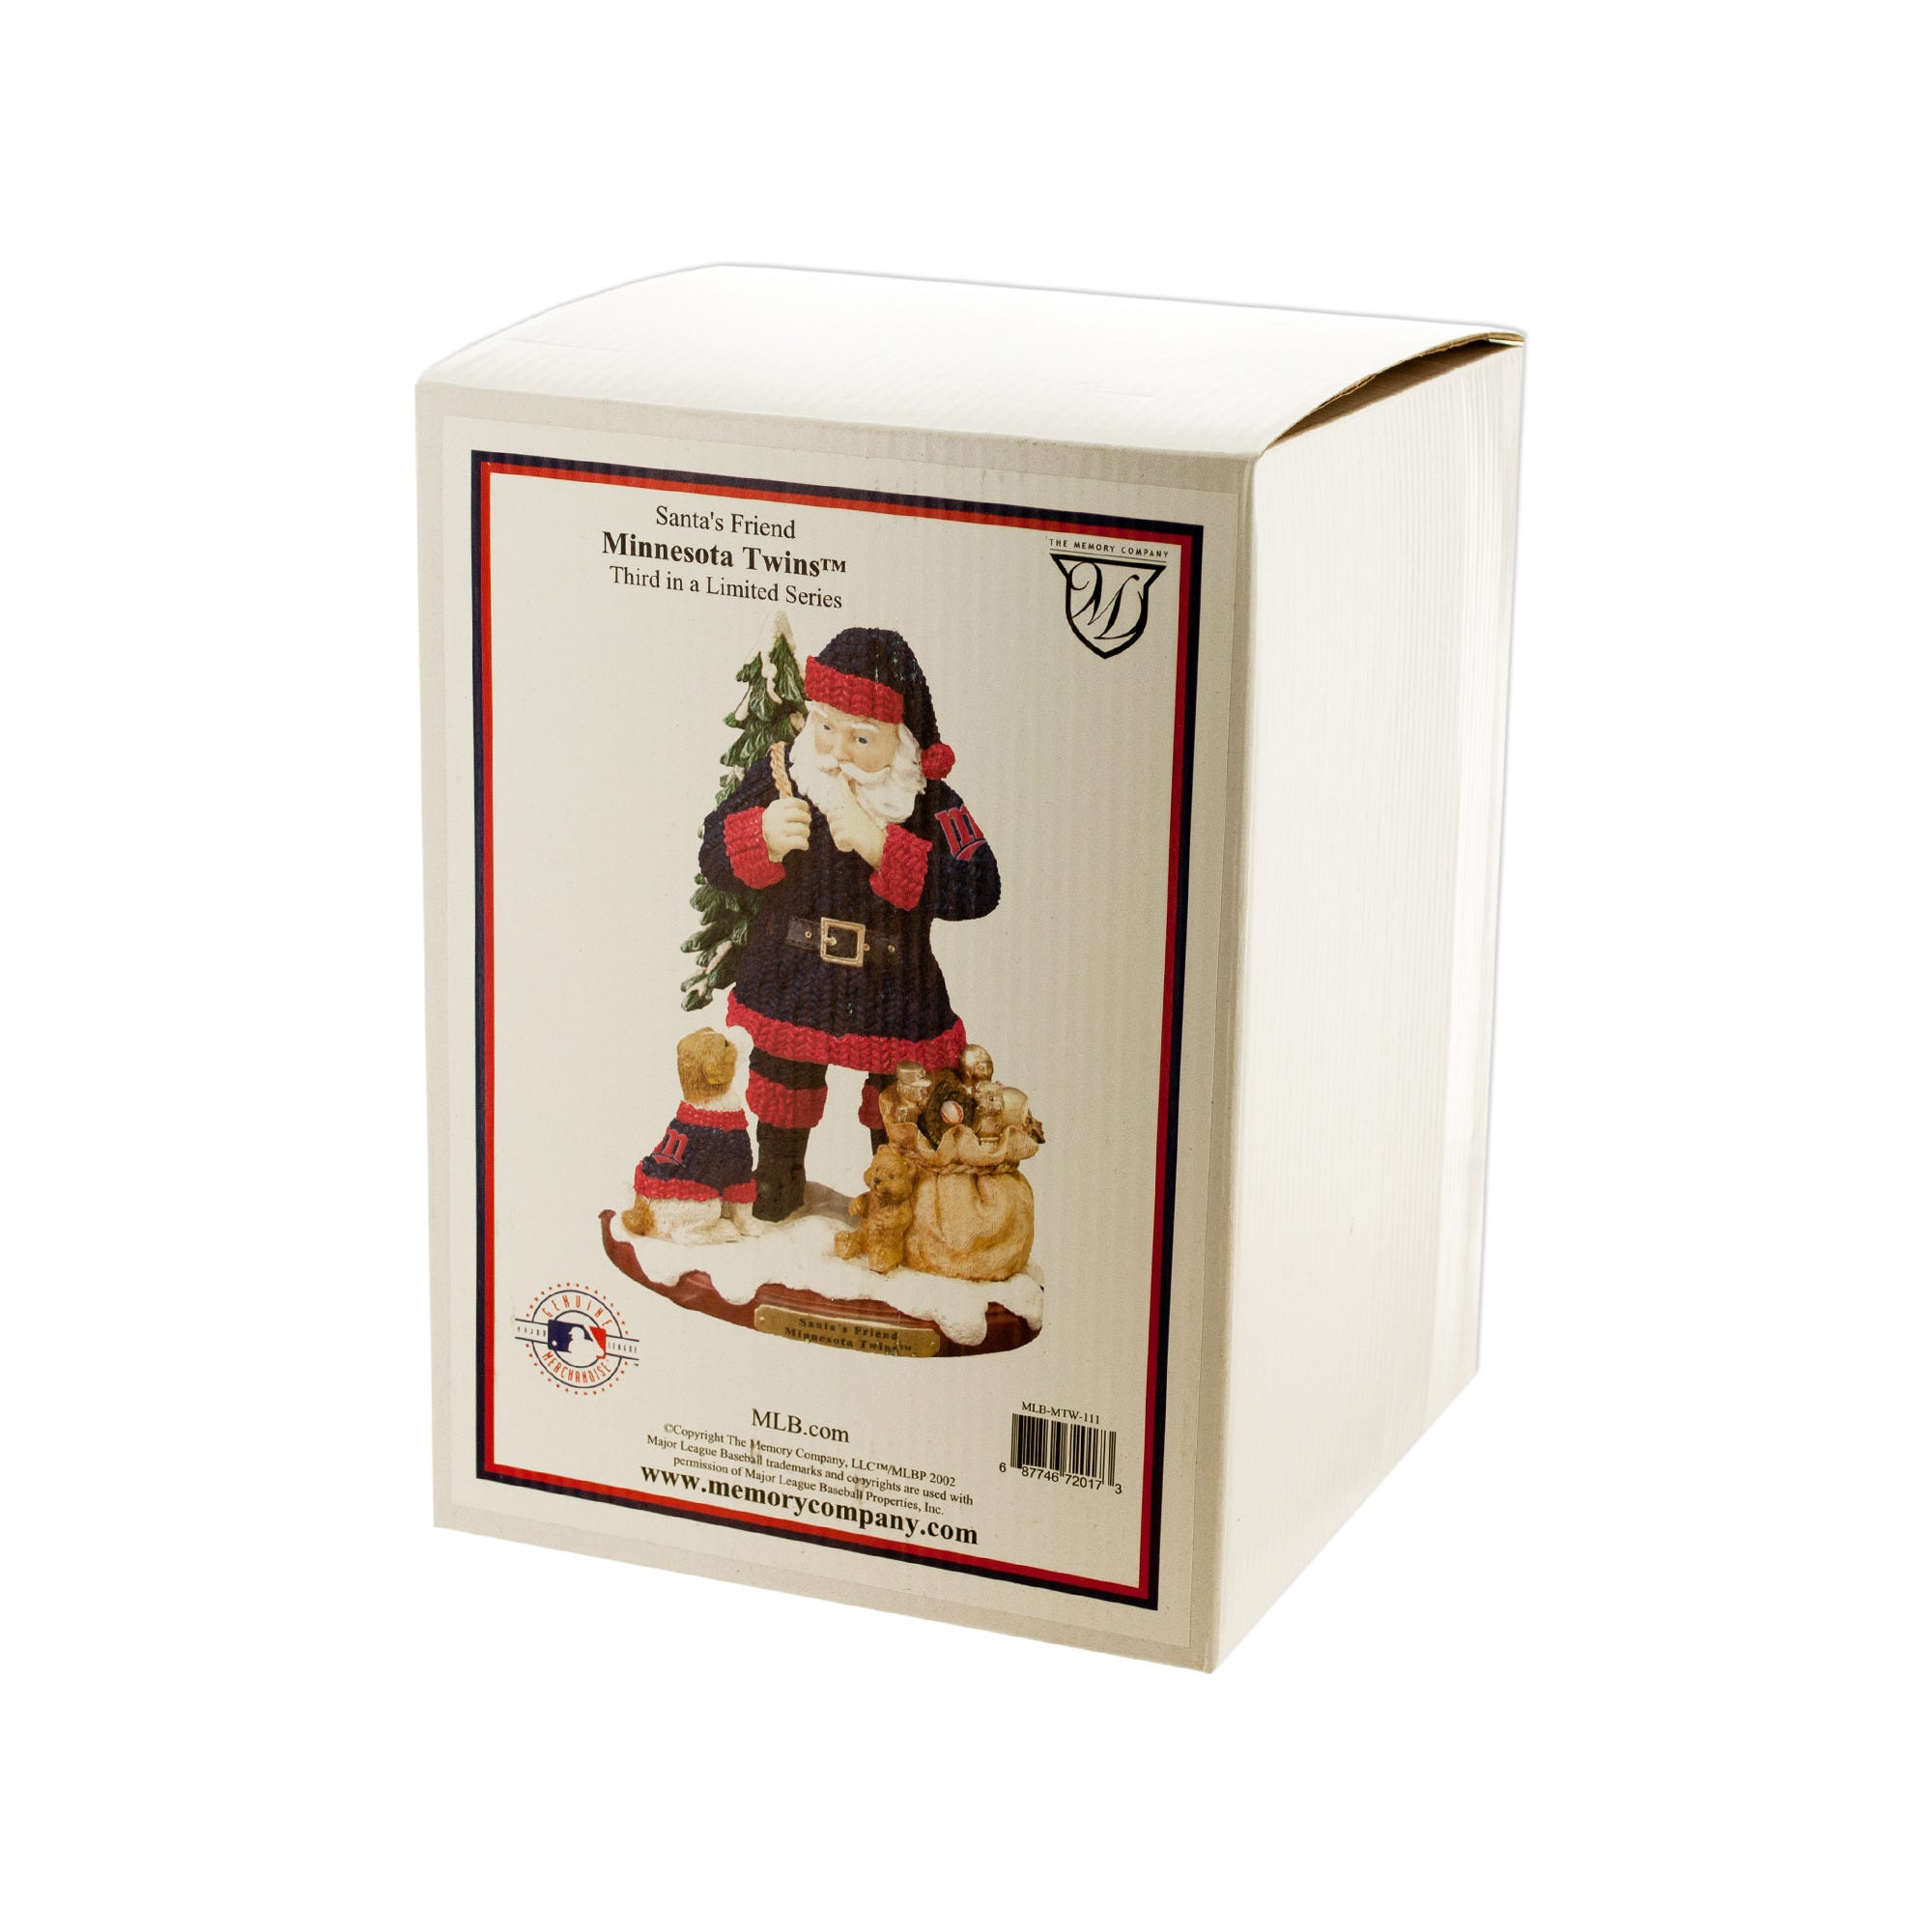 minnesota-twins-santa-s-friend-FIGURINE